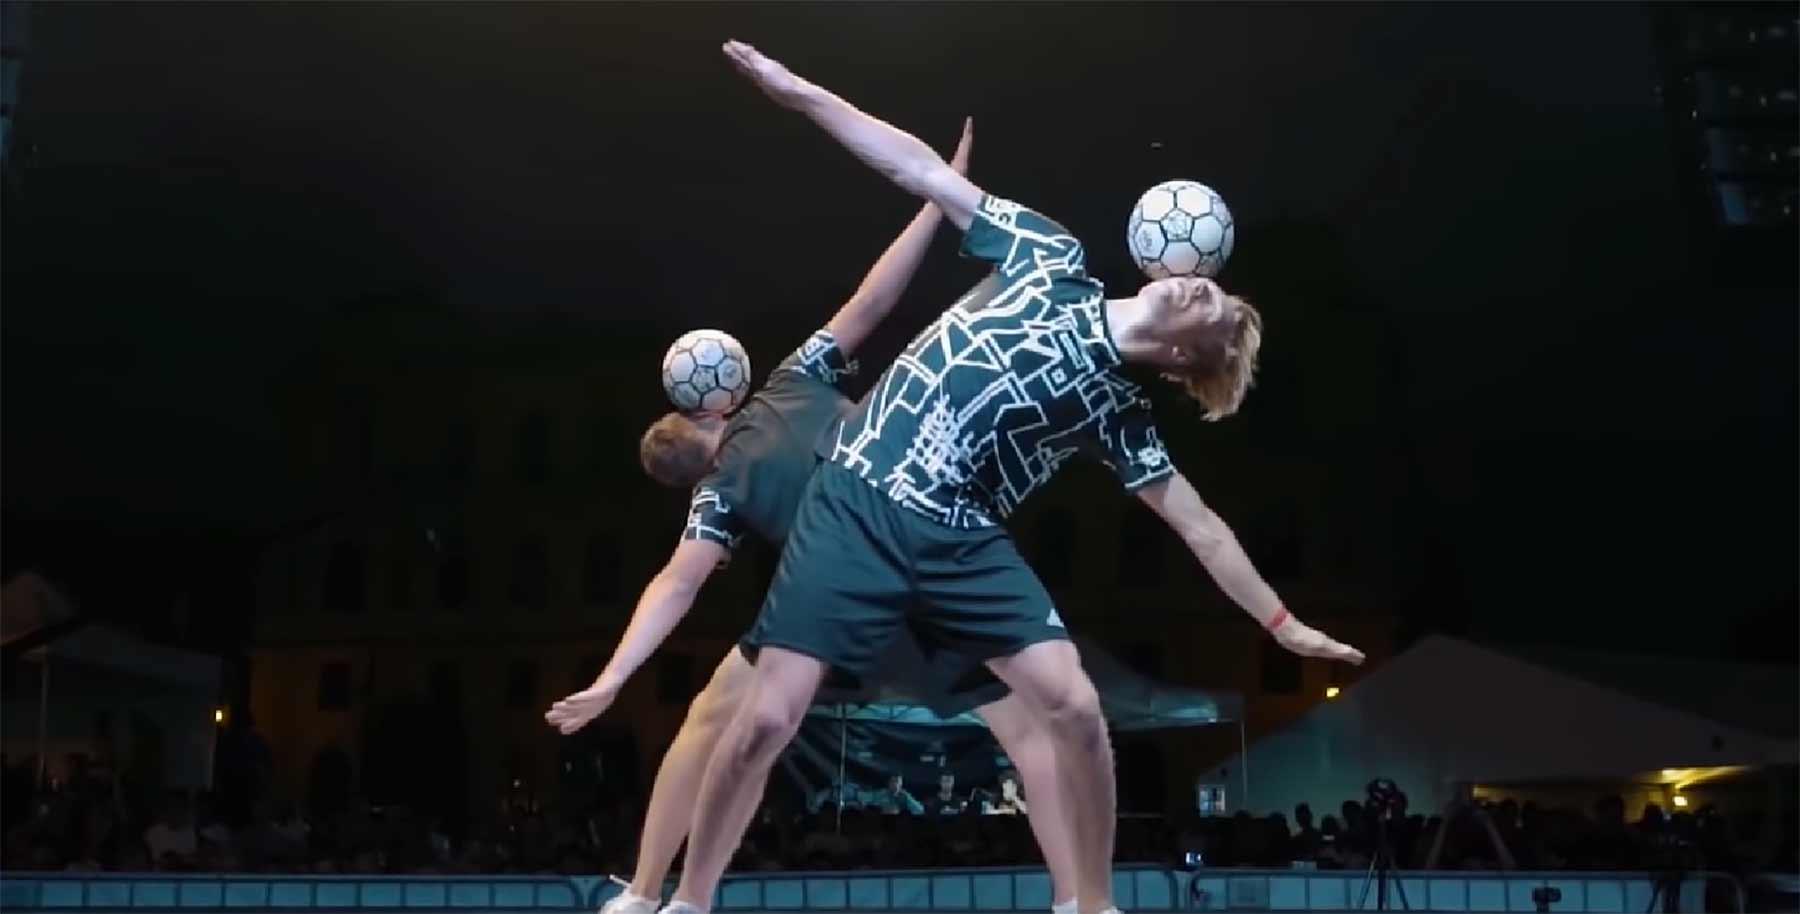 Fußball-Akrobatik: Superball